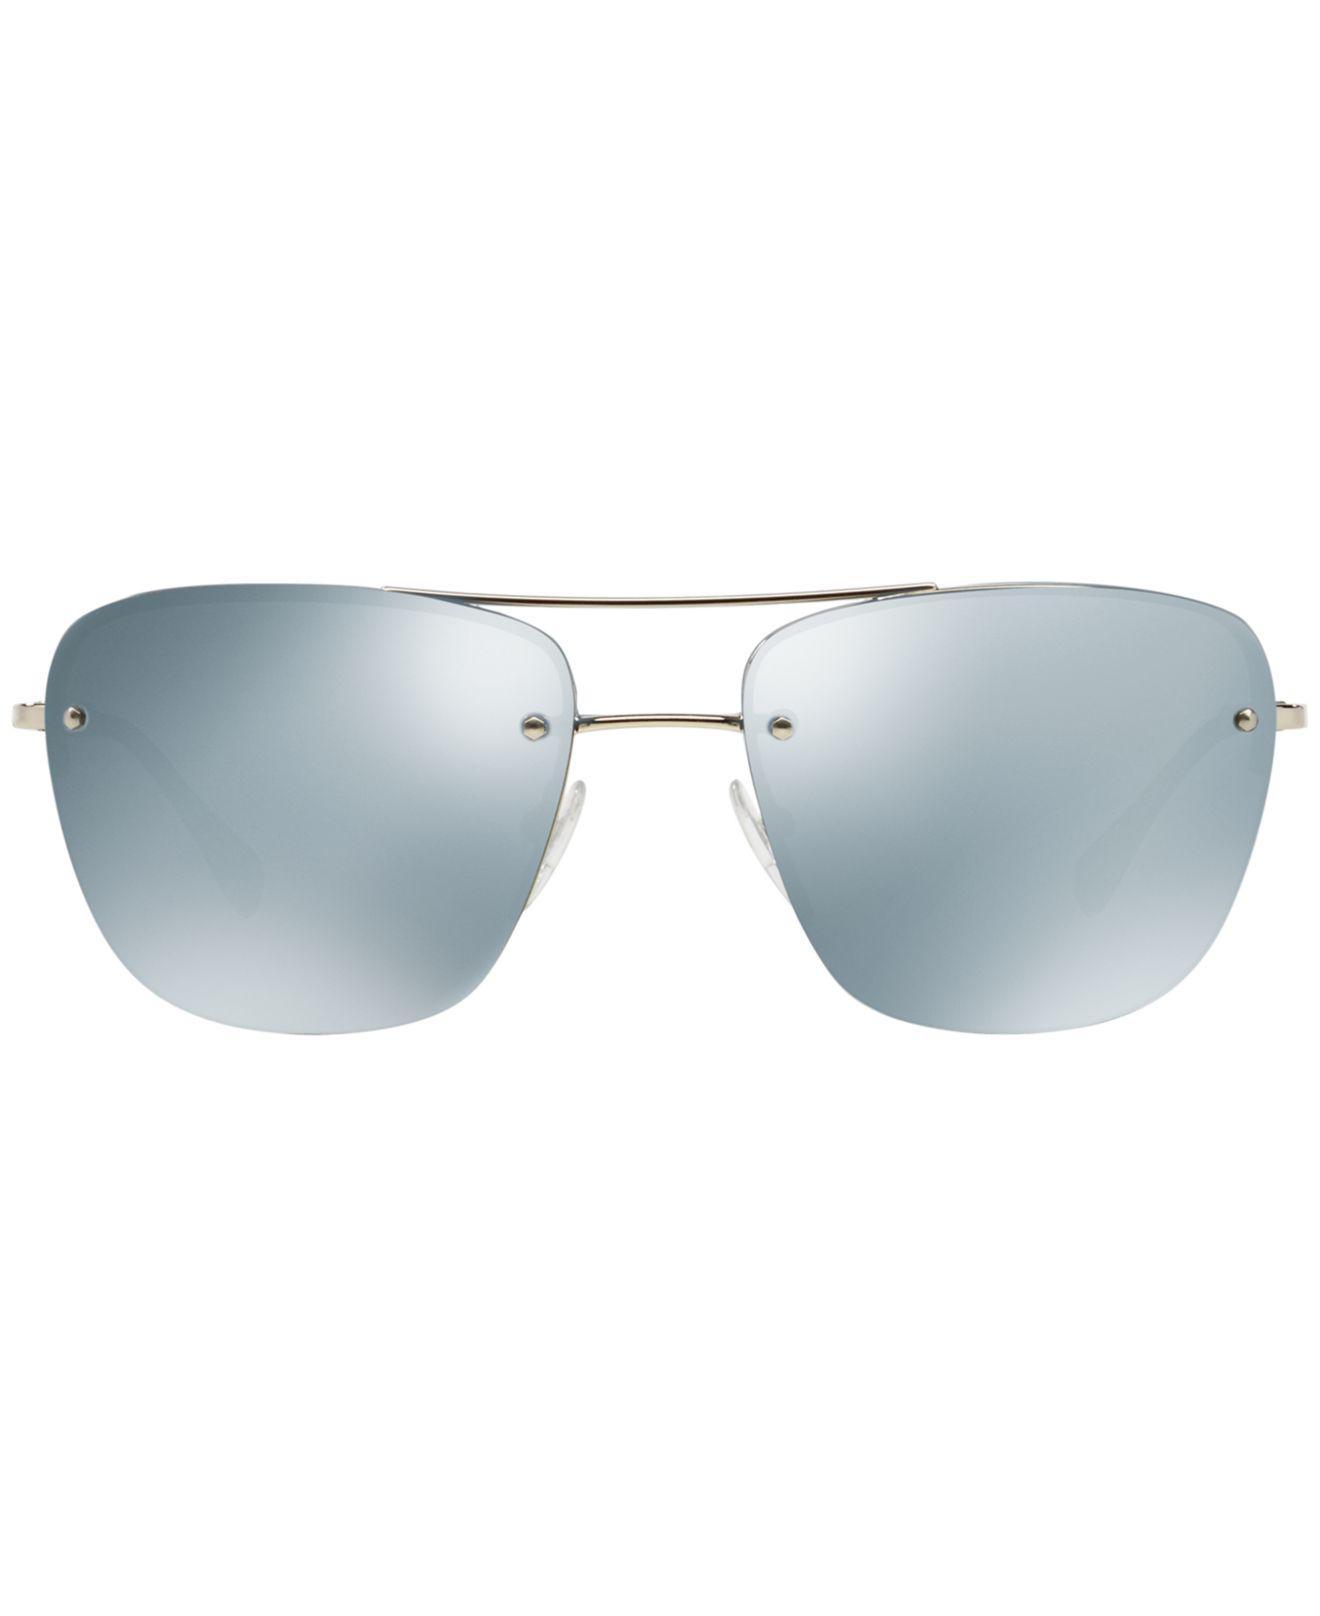 2064993aa185 ... greece lyst prada sunglasses ps 52rs in metallic for men ede4b b5627